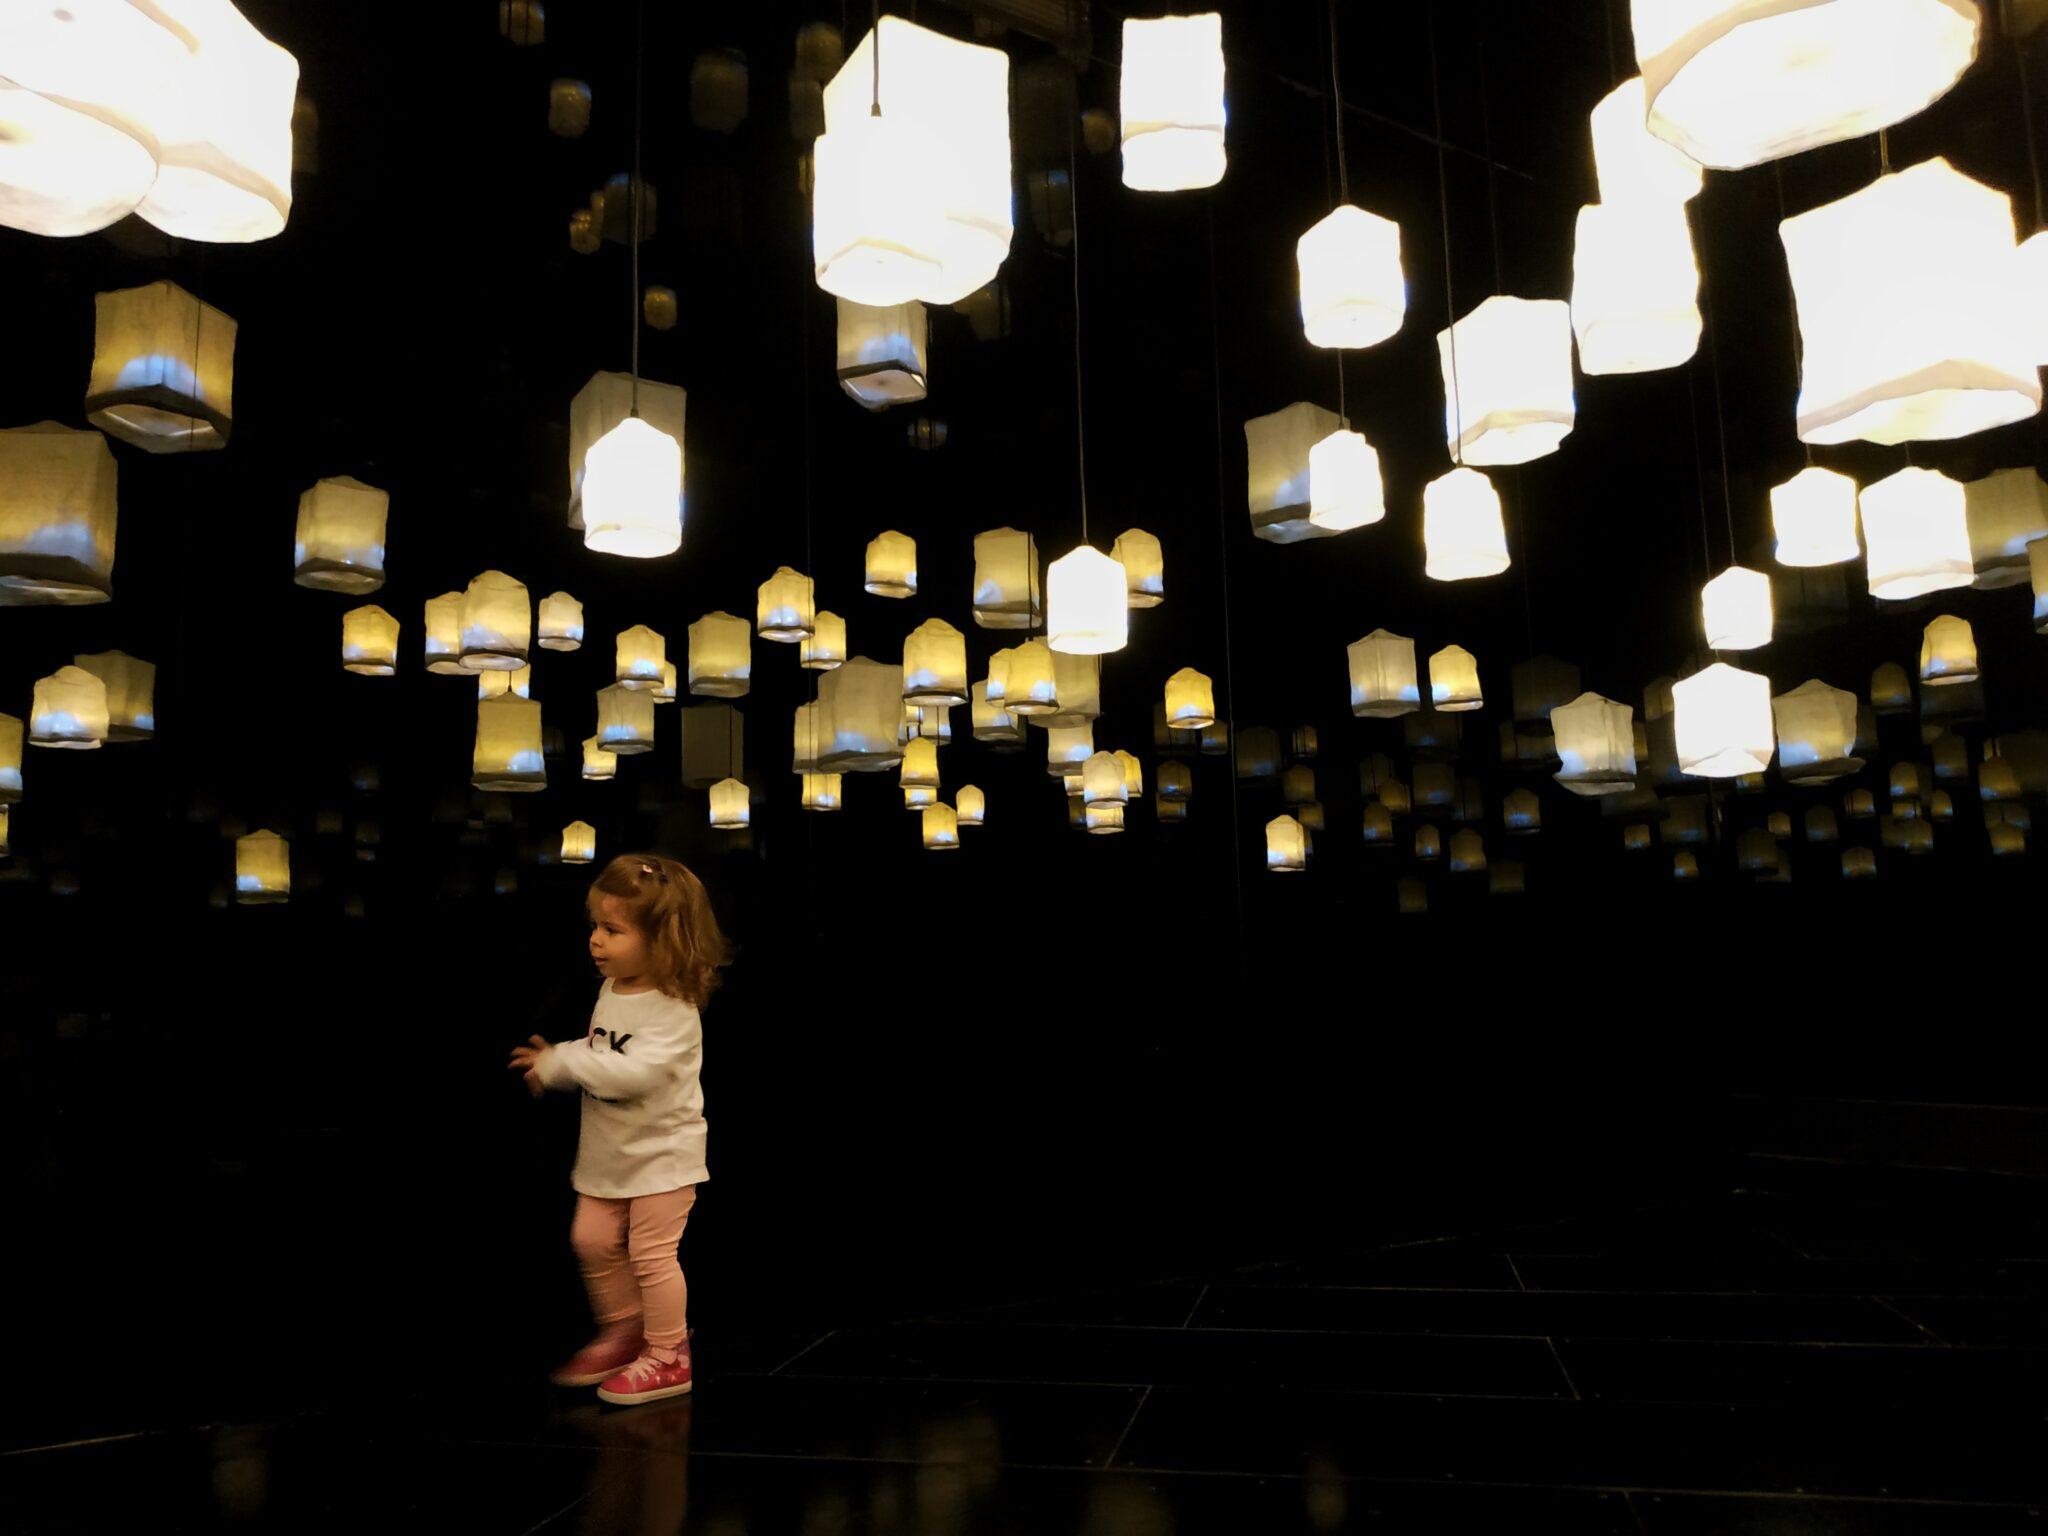 IMG 20200926 165221 01 scaled - Visitar IKONO Madrid con niños